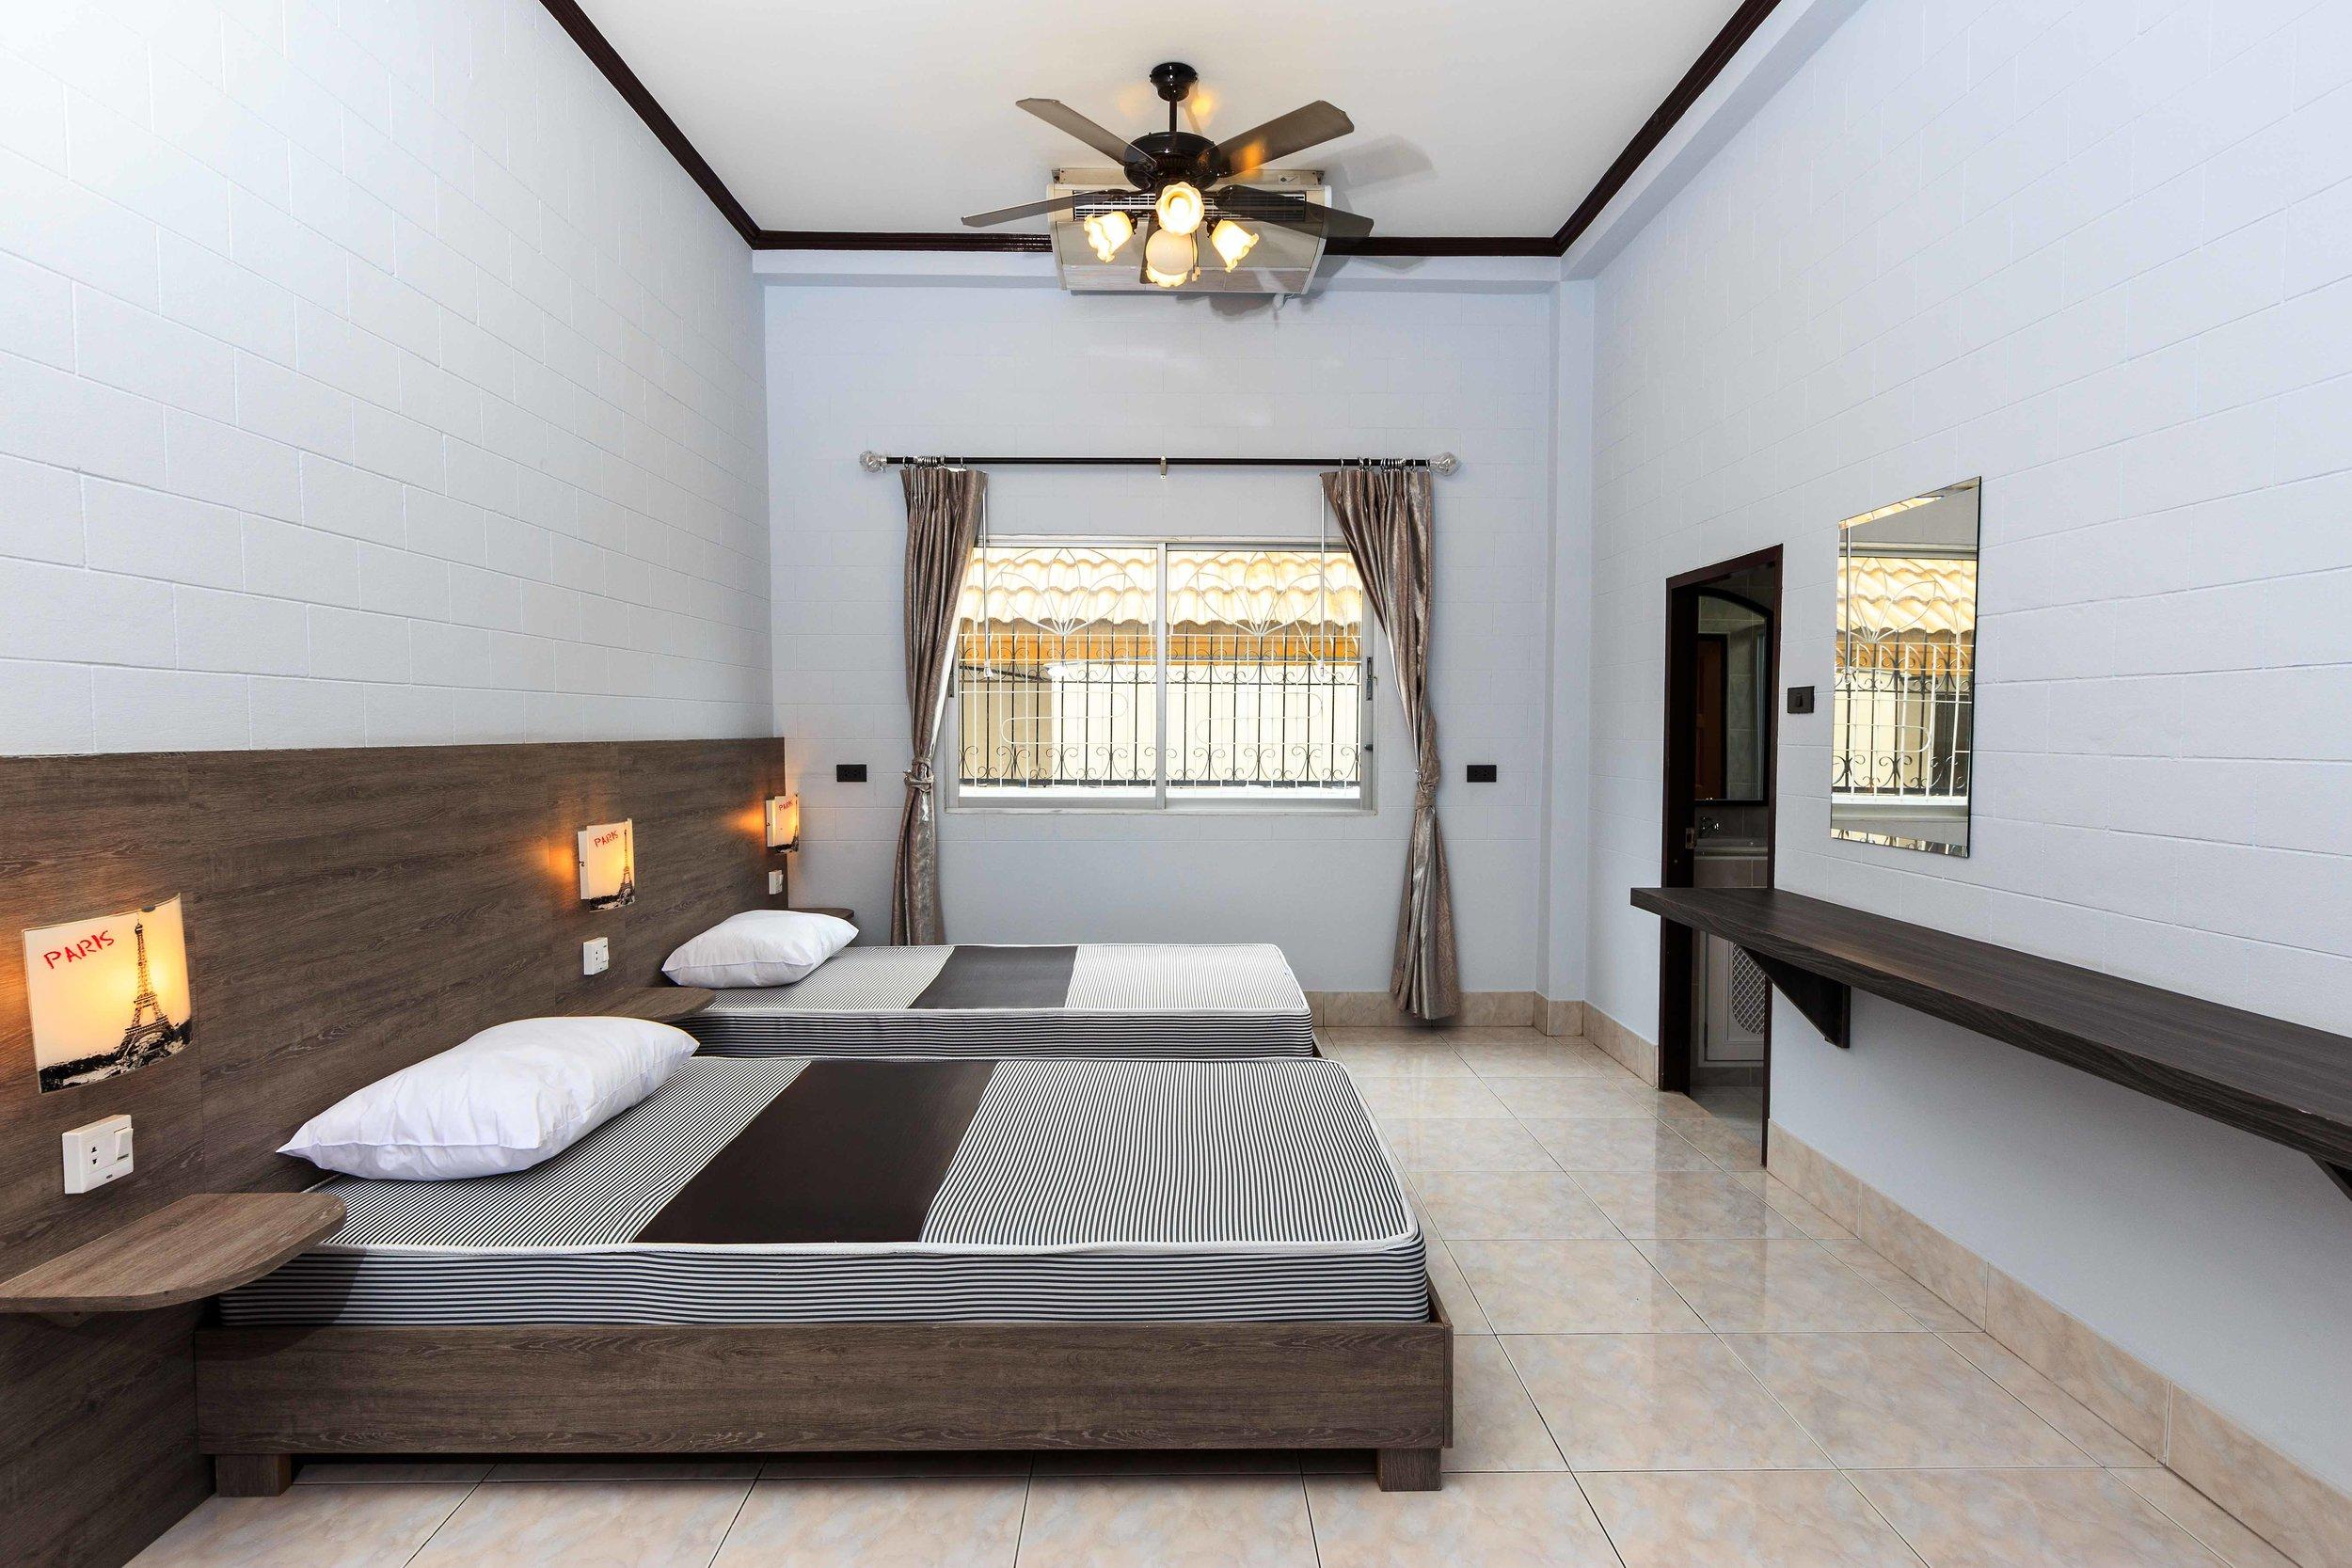 Room02-01.jpg